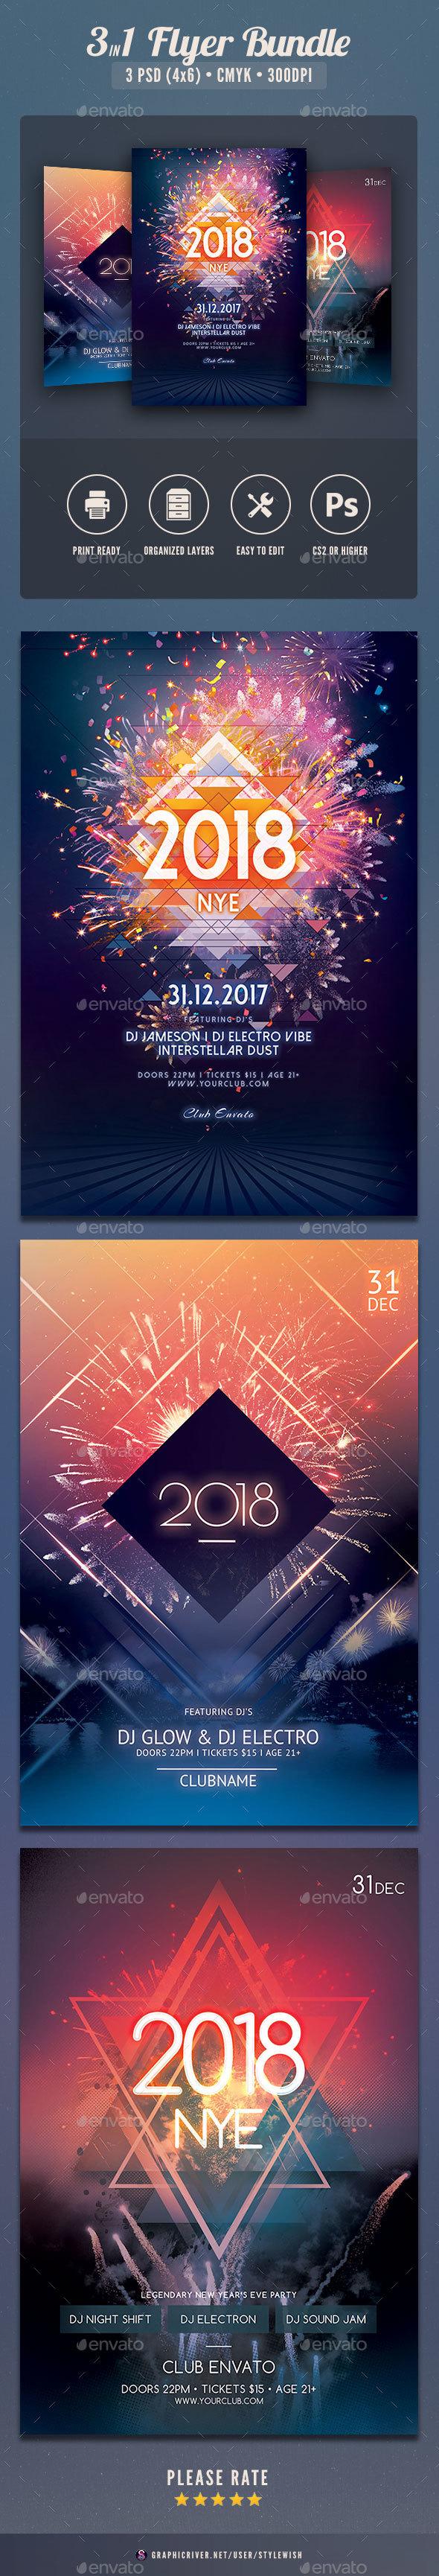 GraphicRiver New Year Flyer Bundle Vol.11 21159783